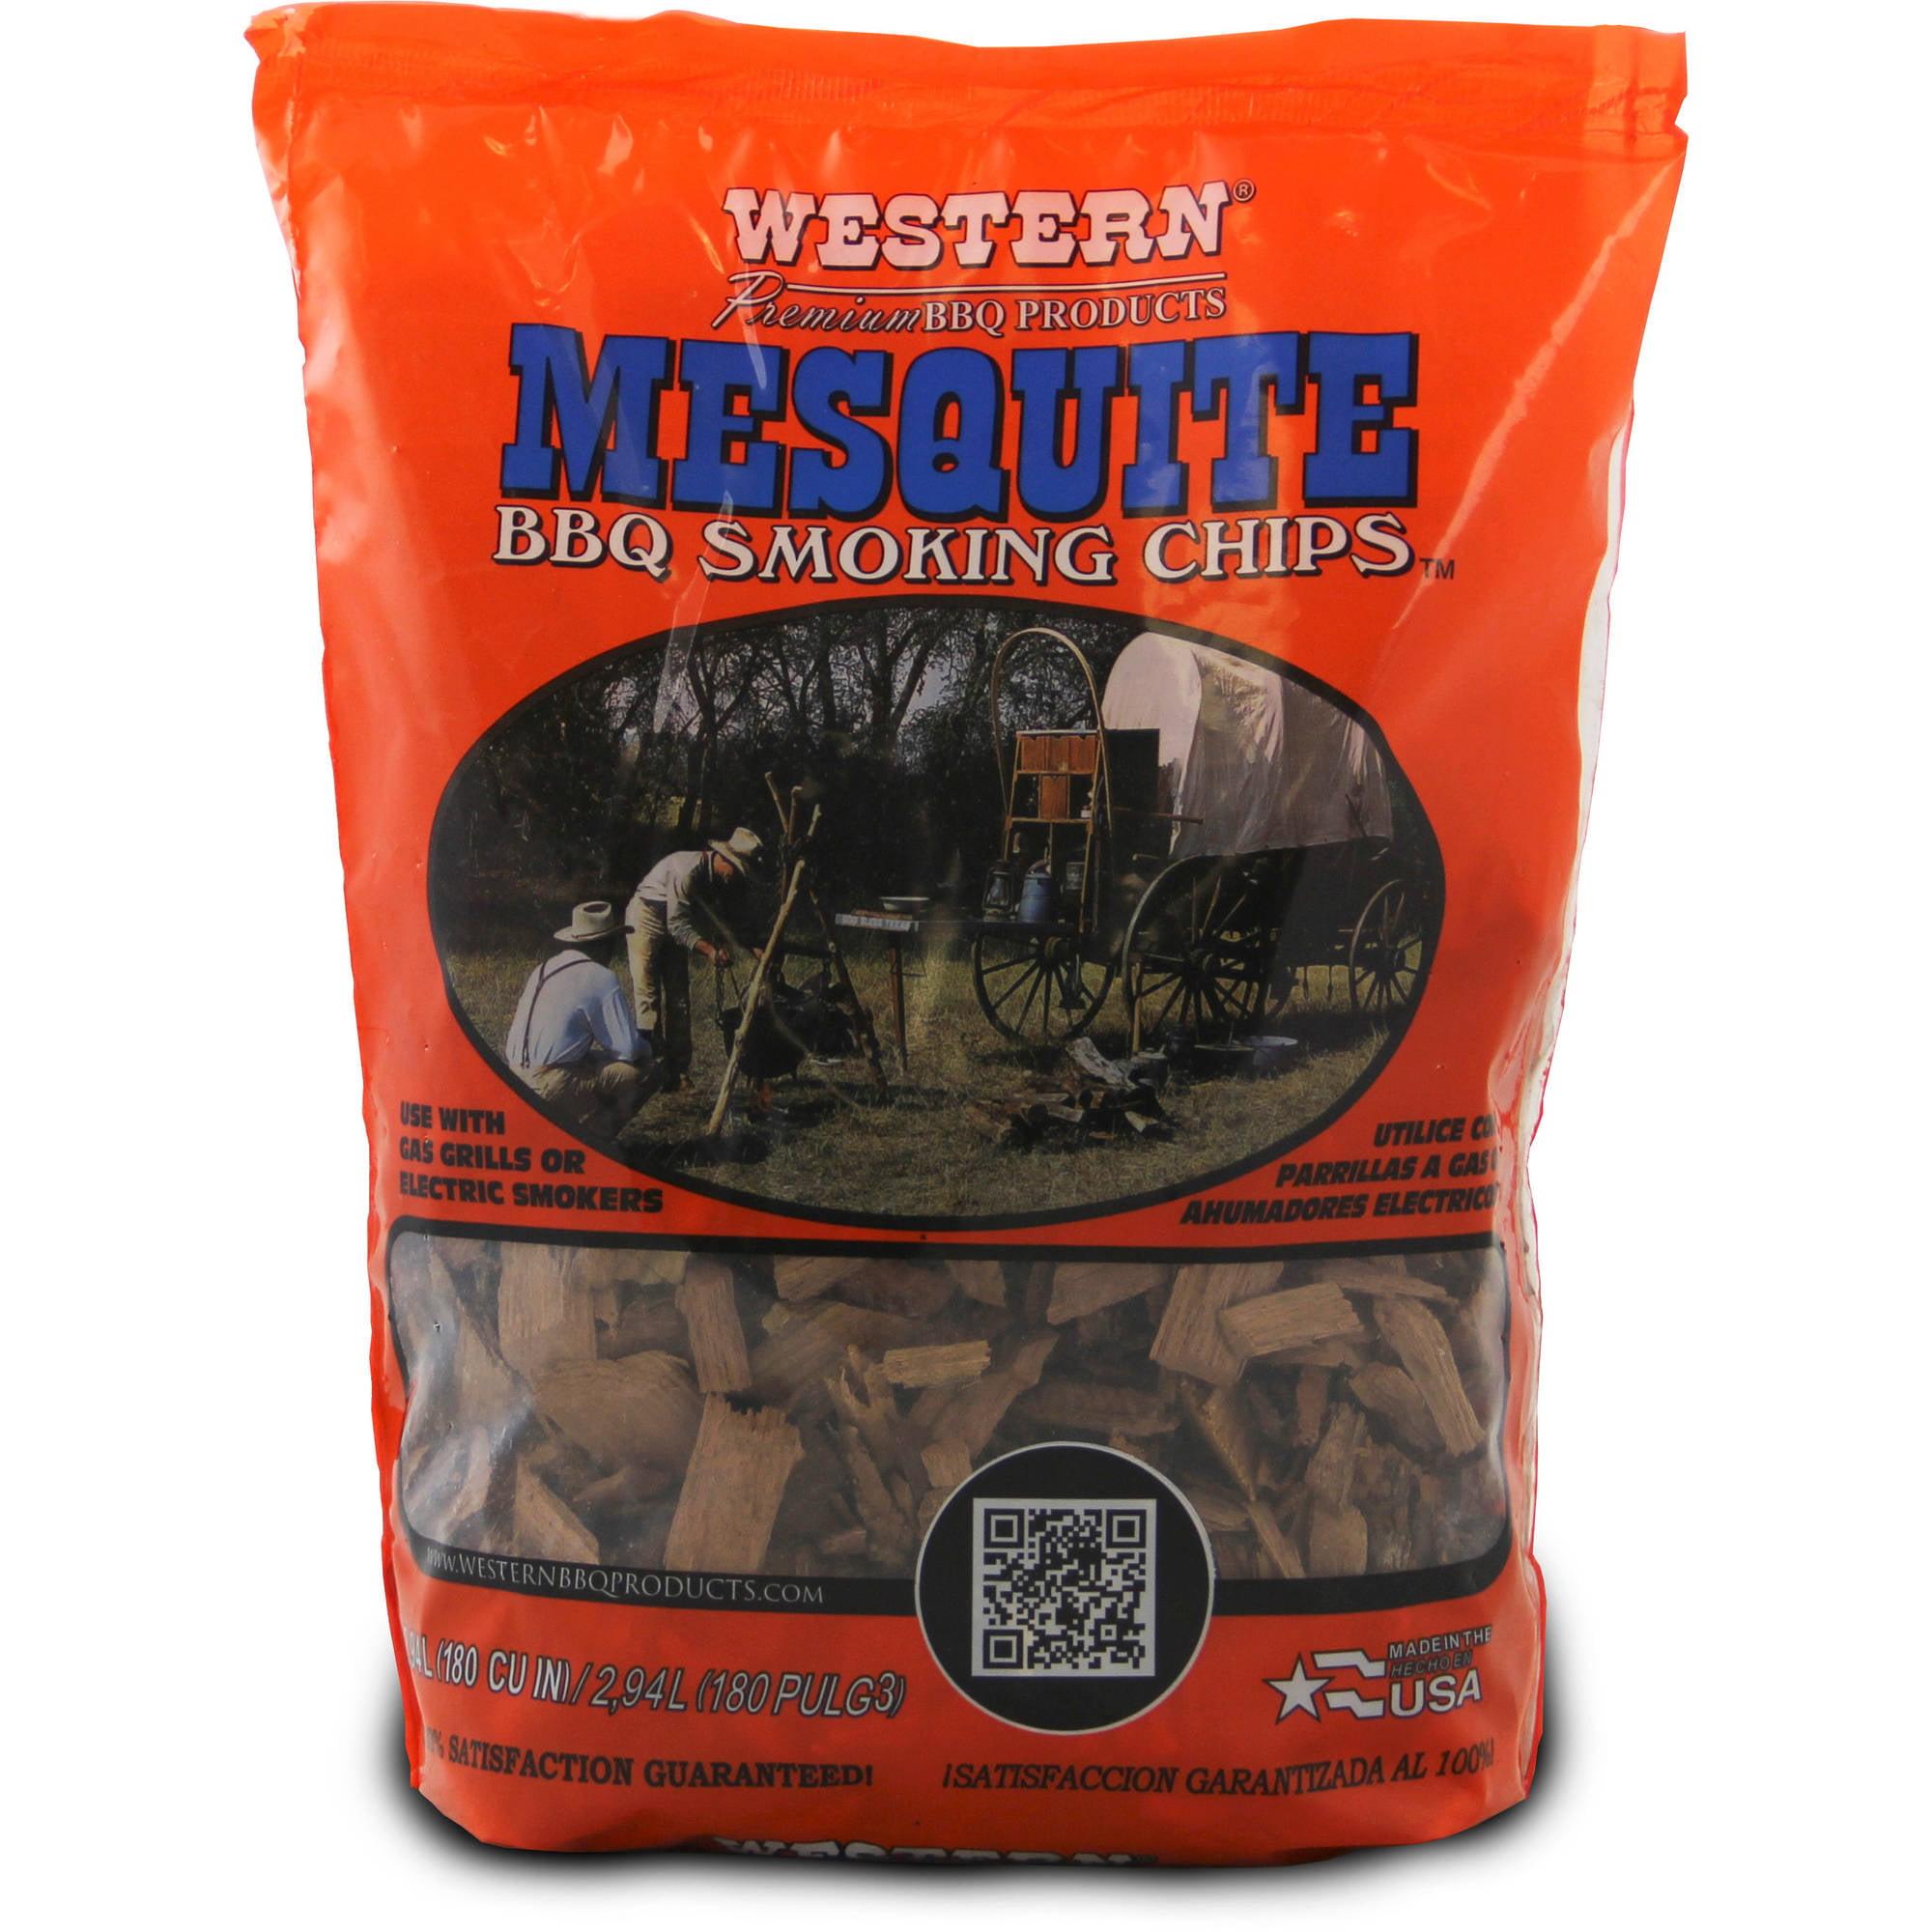 Western Smokin' Chips, Mesquite